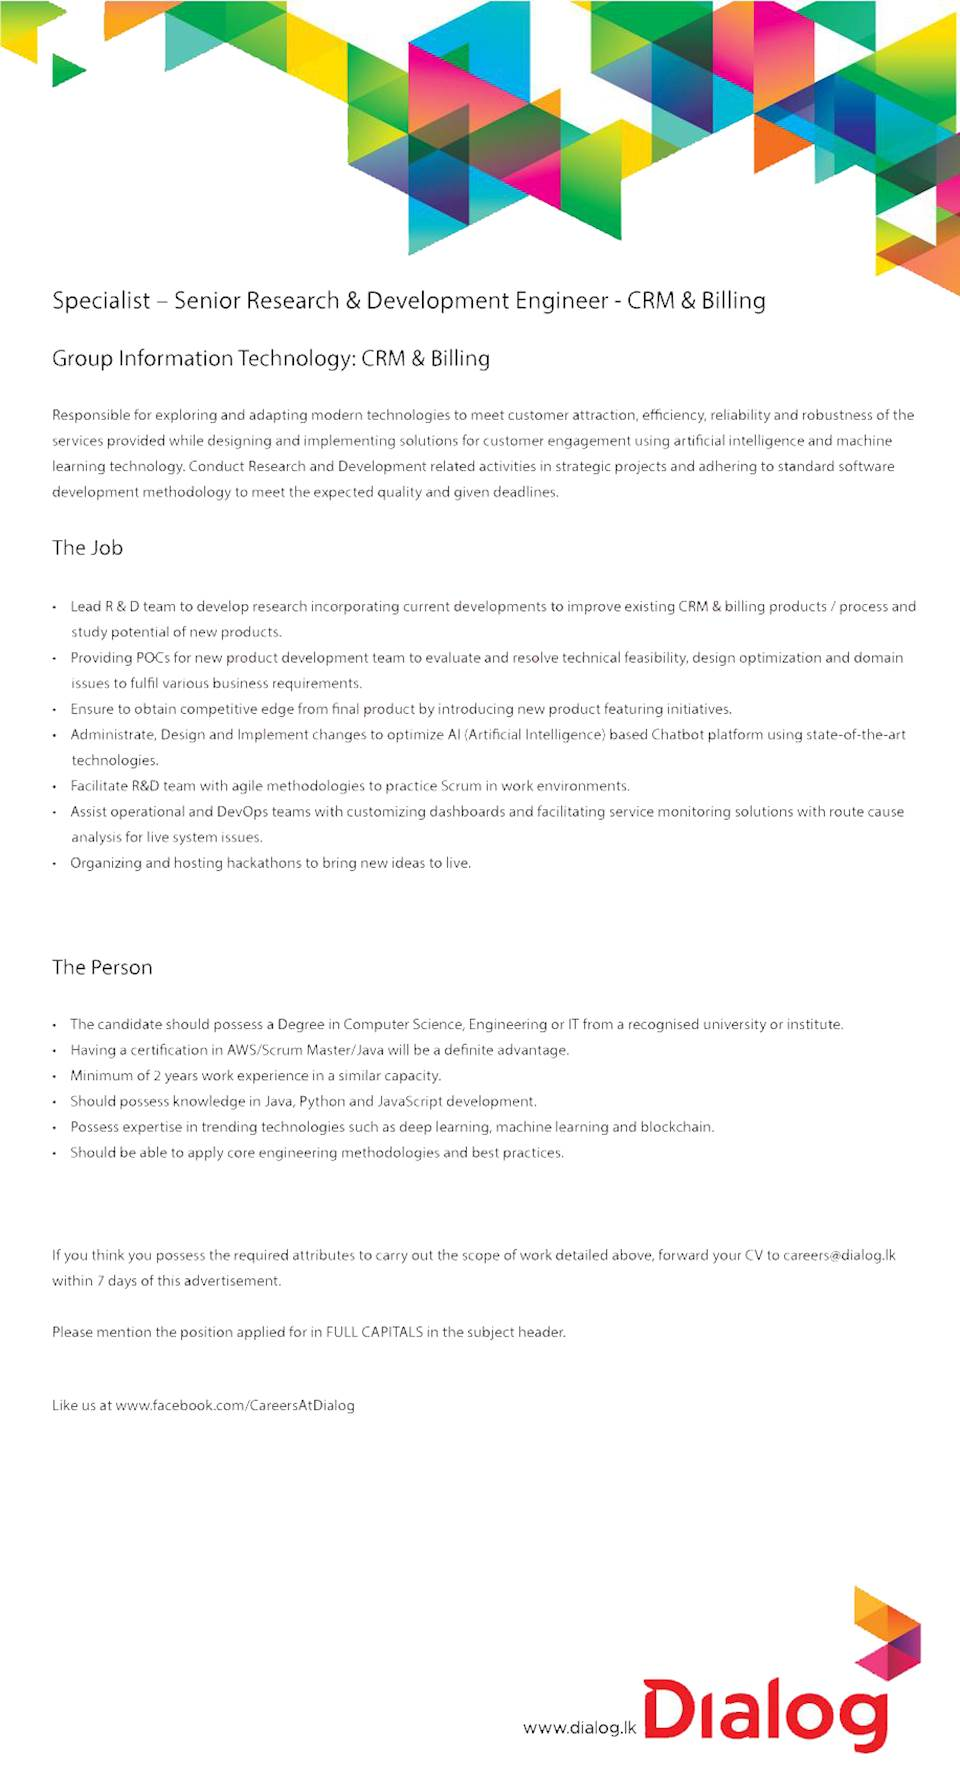 Specialist - Senior Research & Development Engineer - CRM & Billing